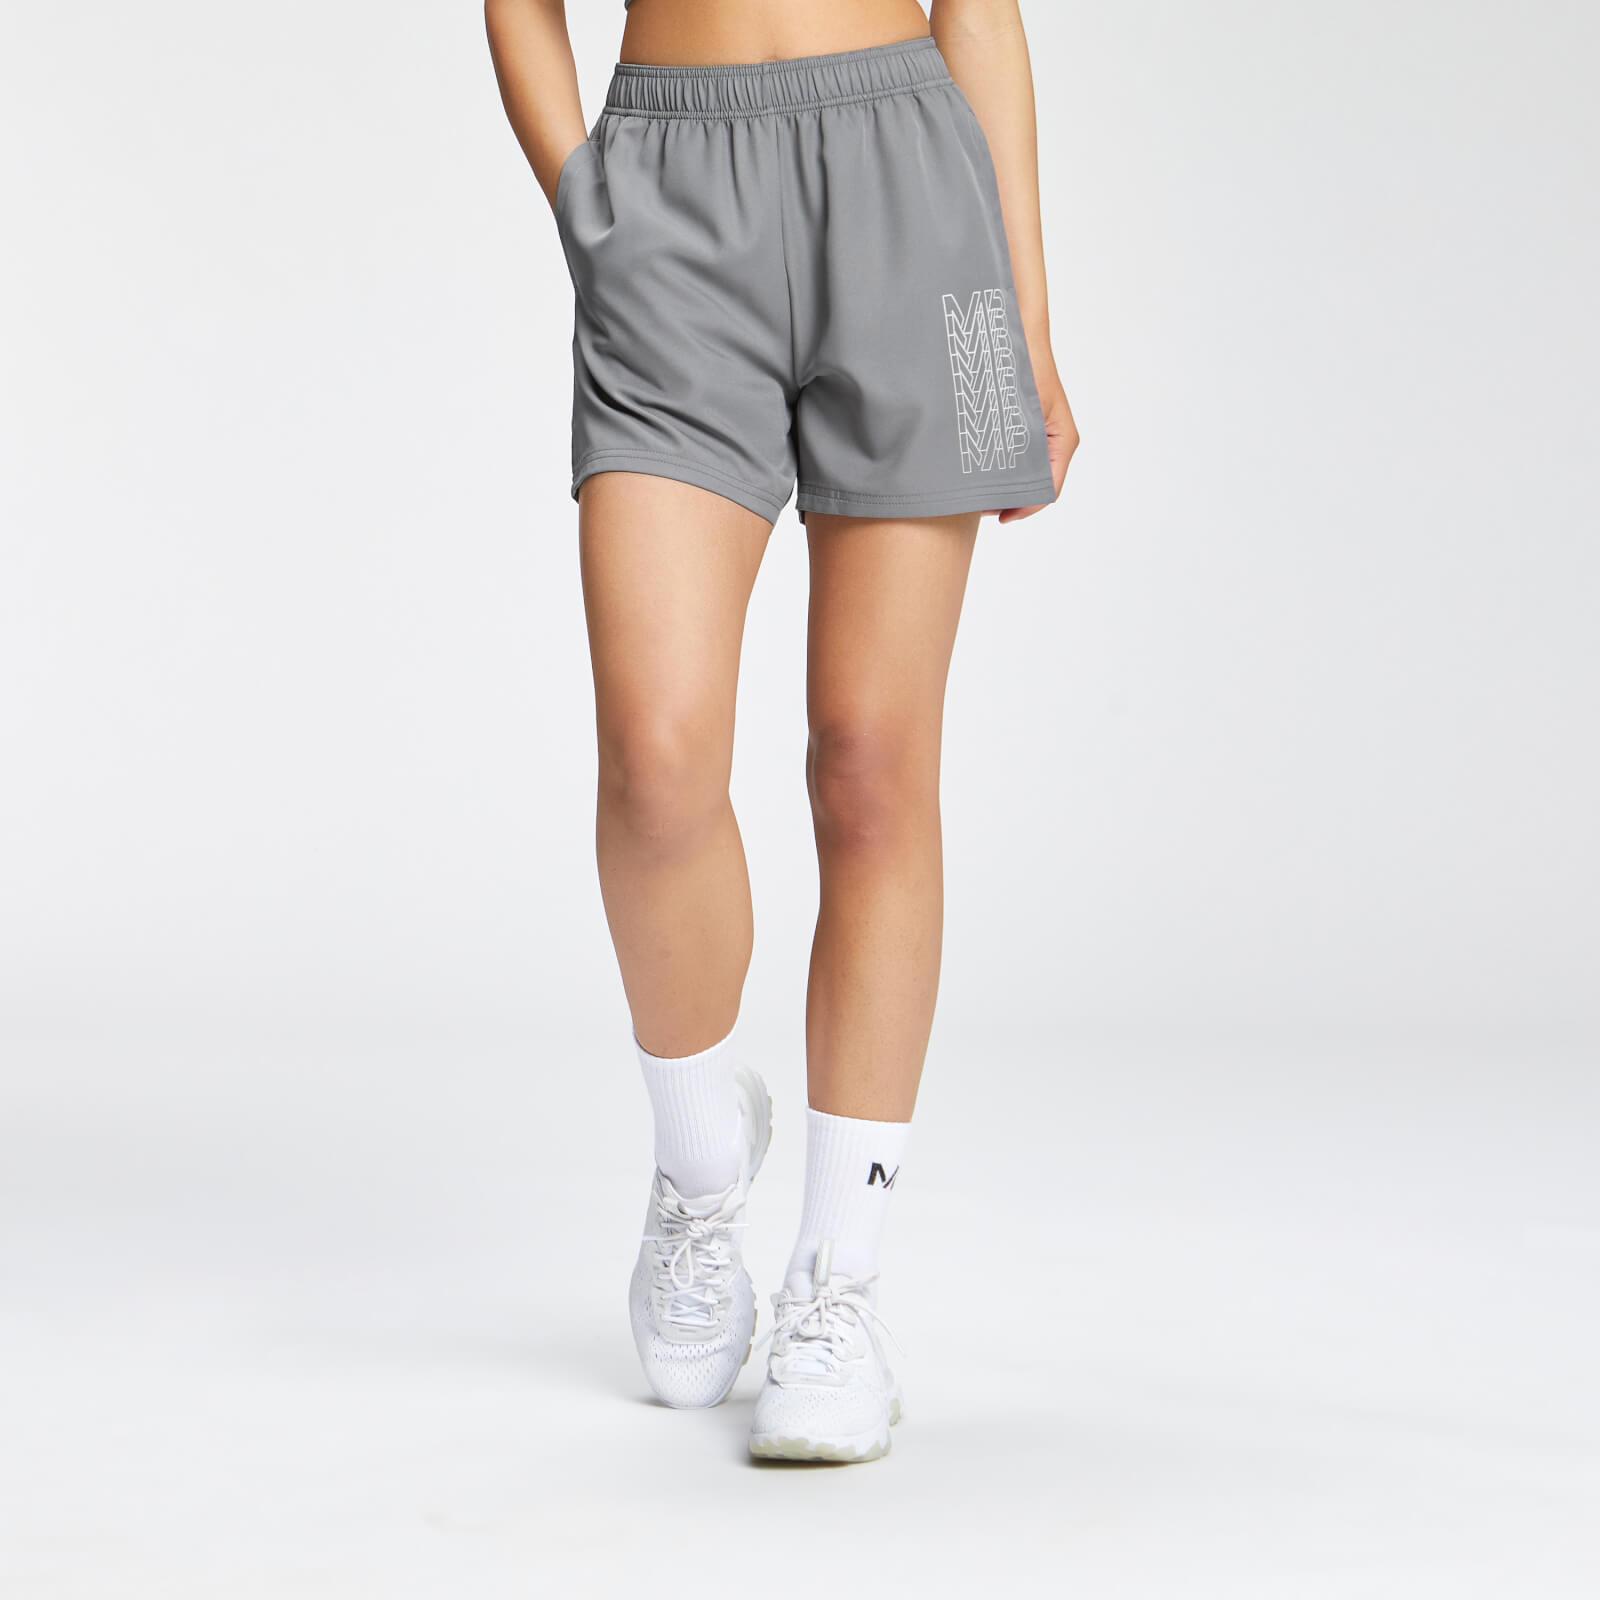 Купить MP Women's Repeat MP Training Shorts - Carbon - XXL, Myprotein International